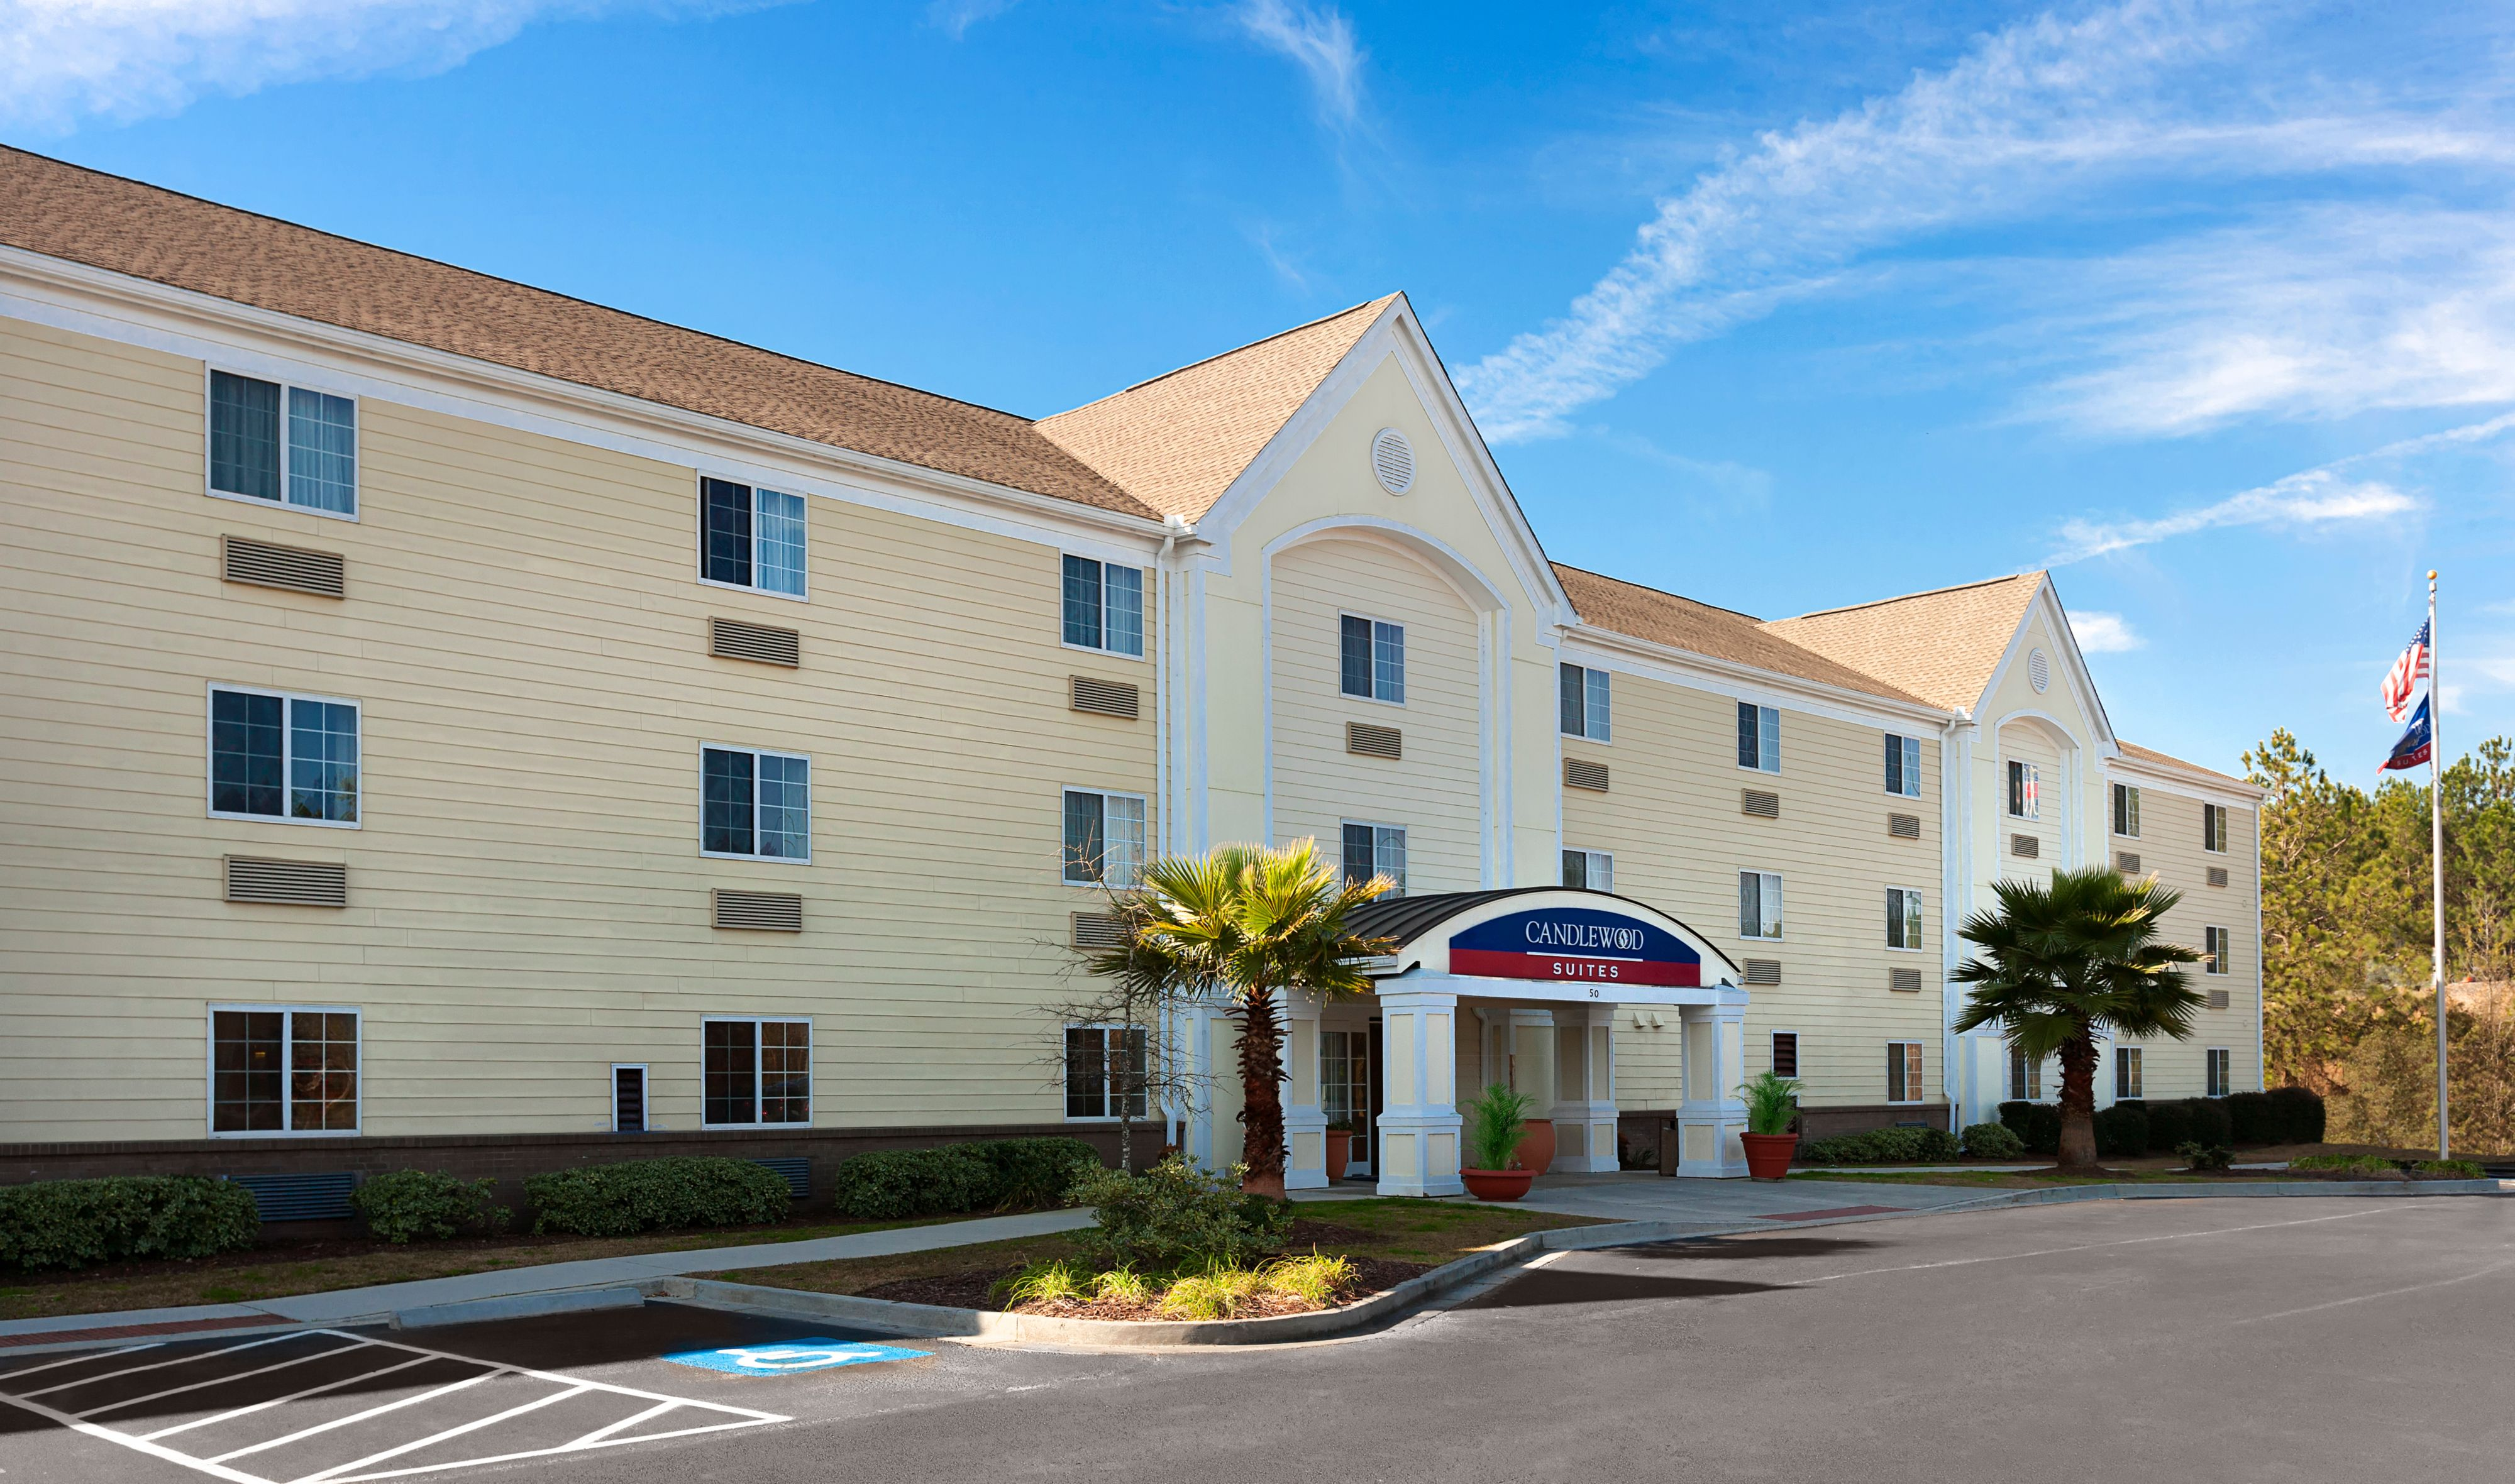 Candlewood Suites San Antonio Nw Medical Center  San Antonio Texas  Tx